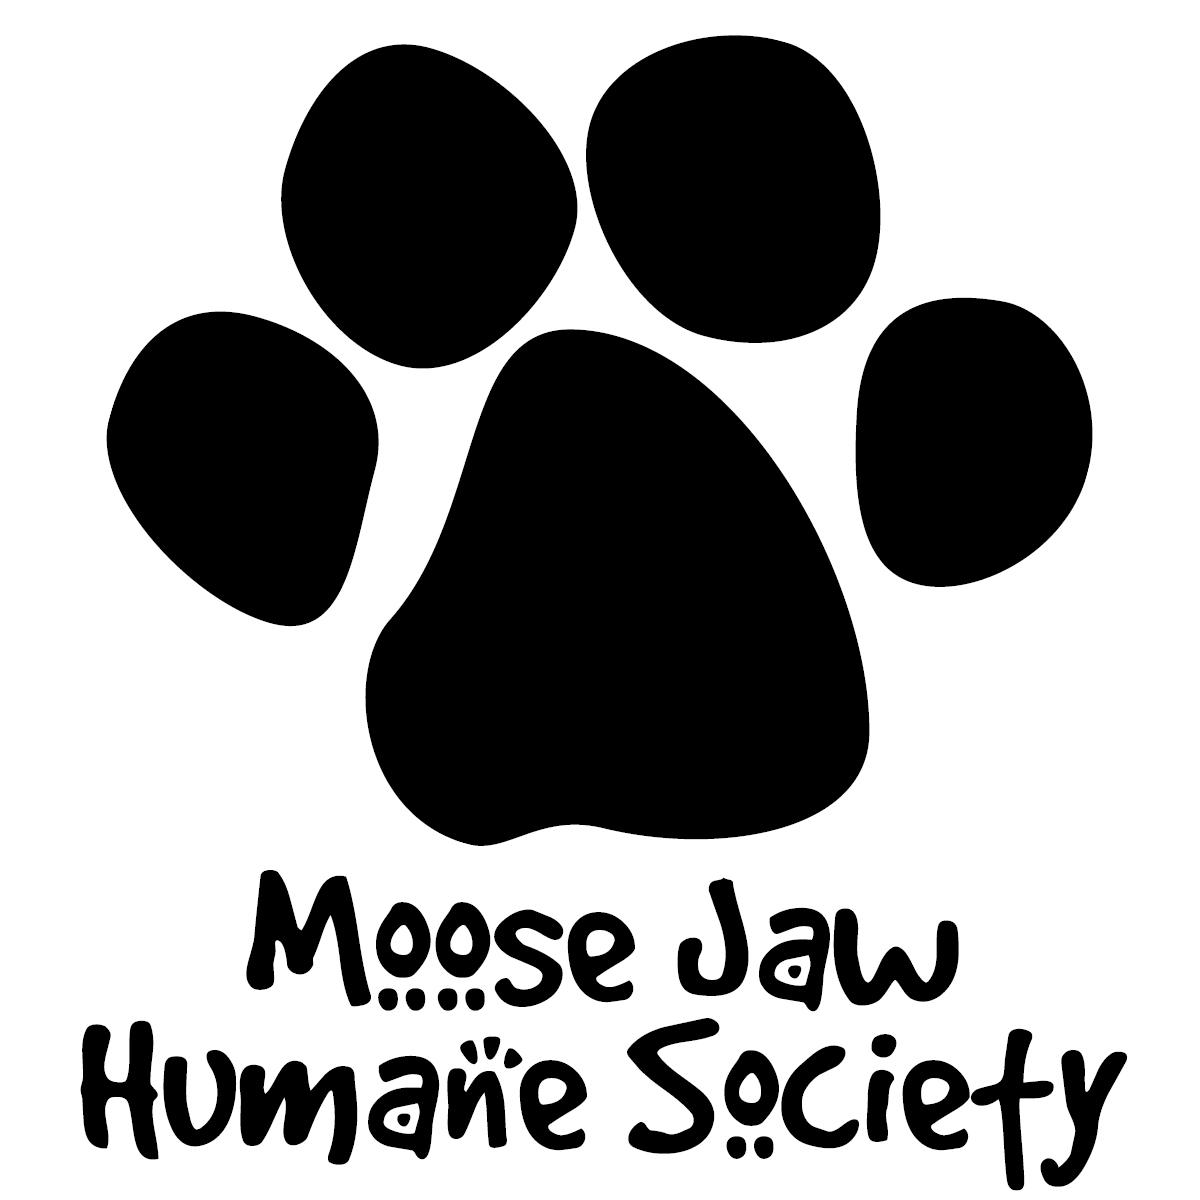 Moose Jaw Humane Society